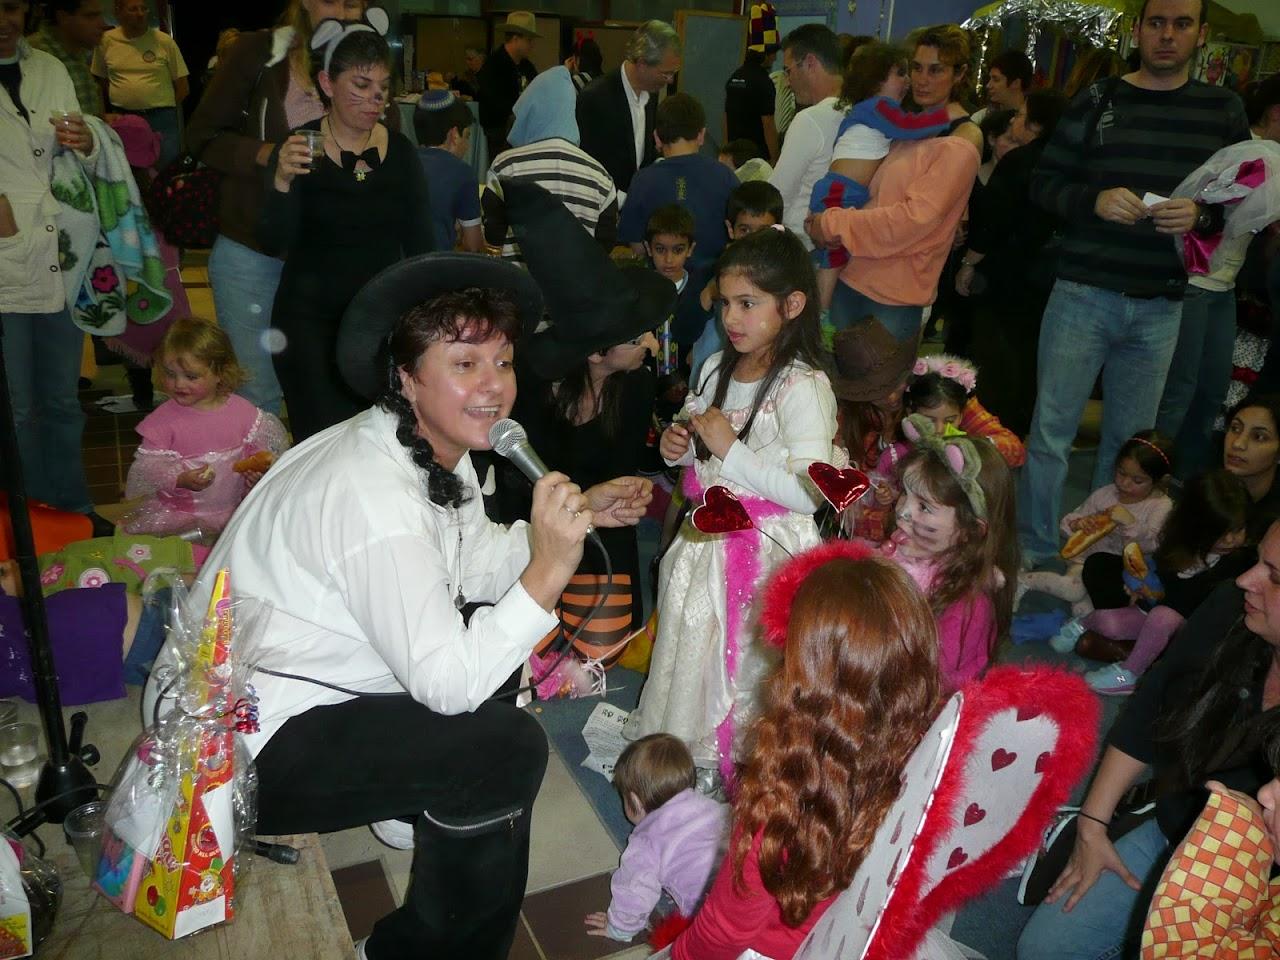 Purim 2008  - 2008-03-20 20.06.47.jpg